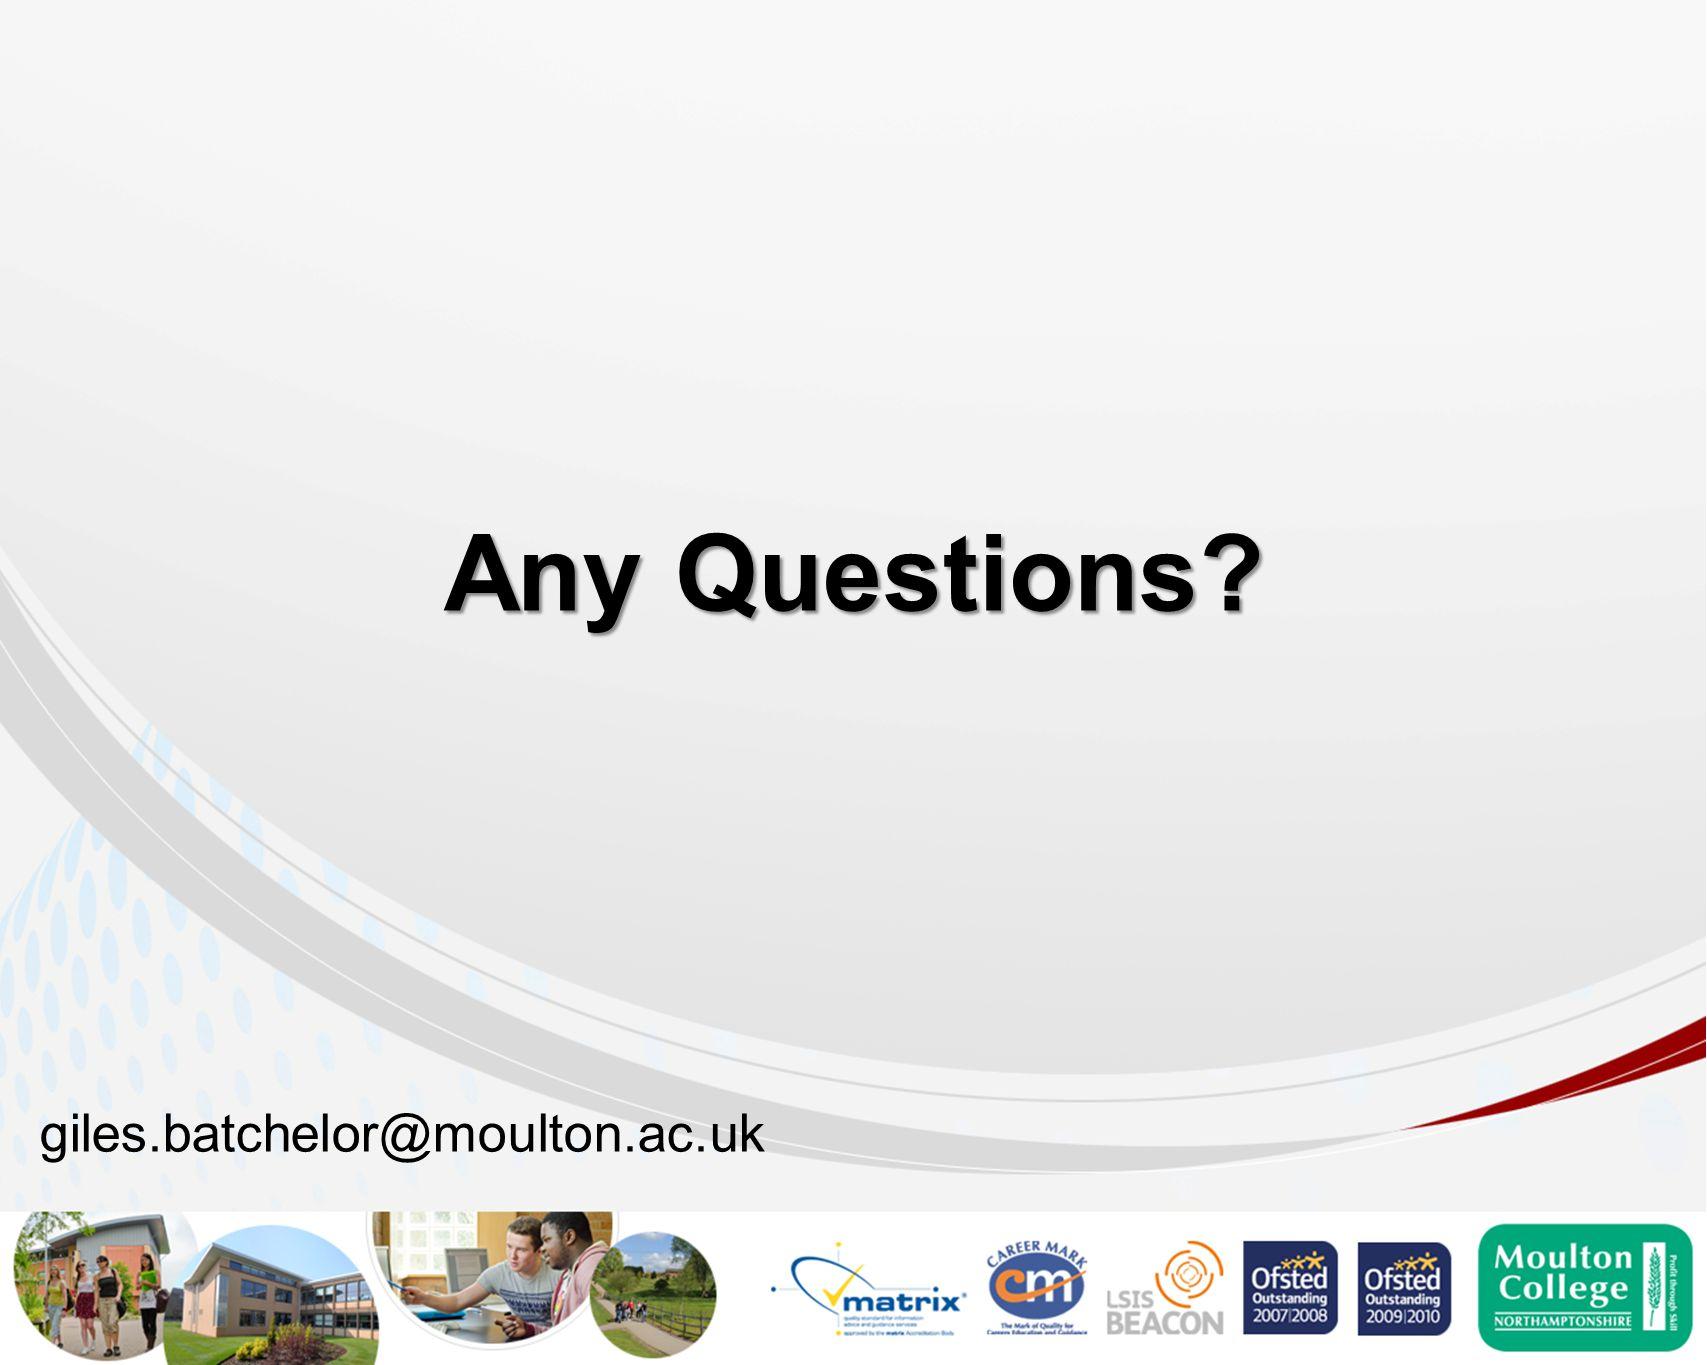 Any Questions? giles.batchelor@moulton.ac.uk